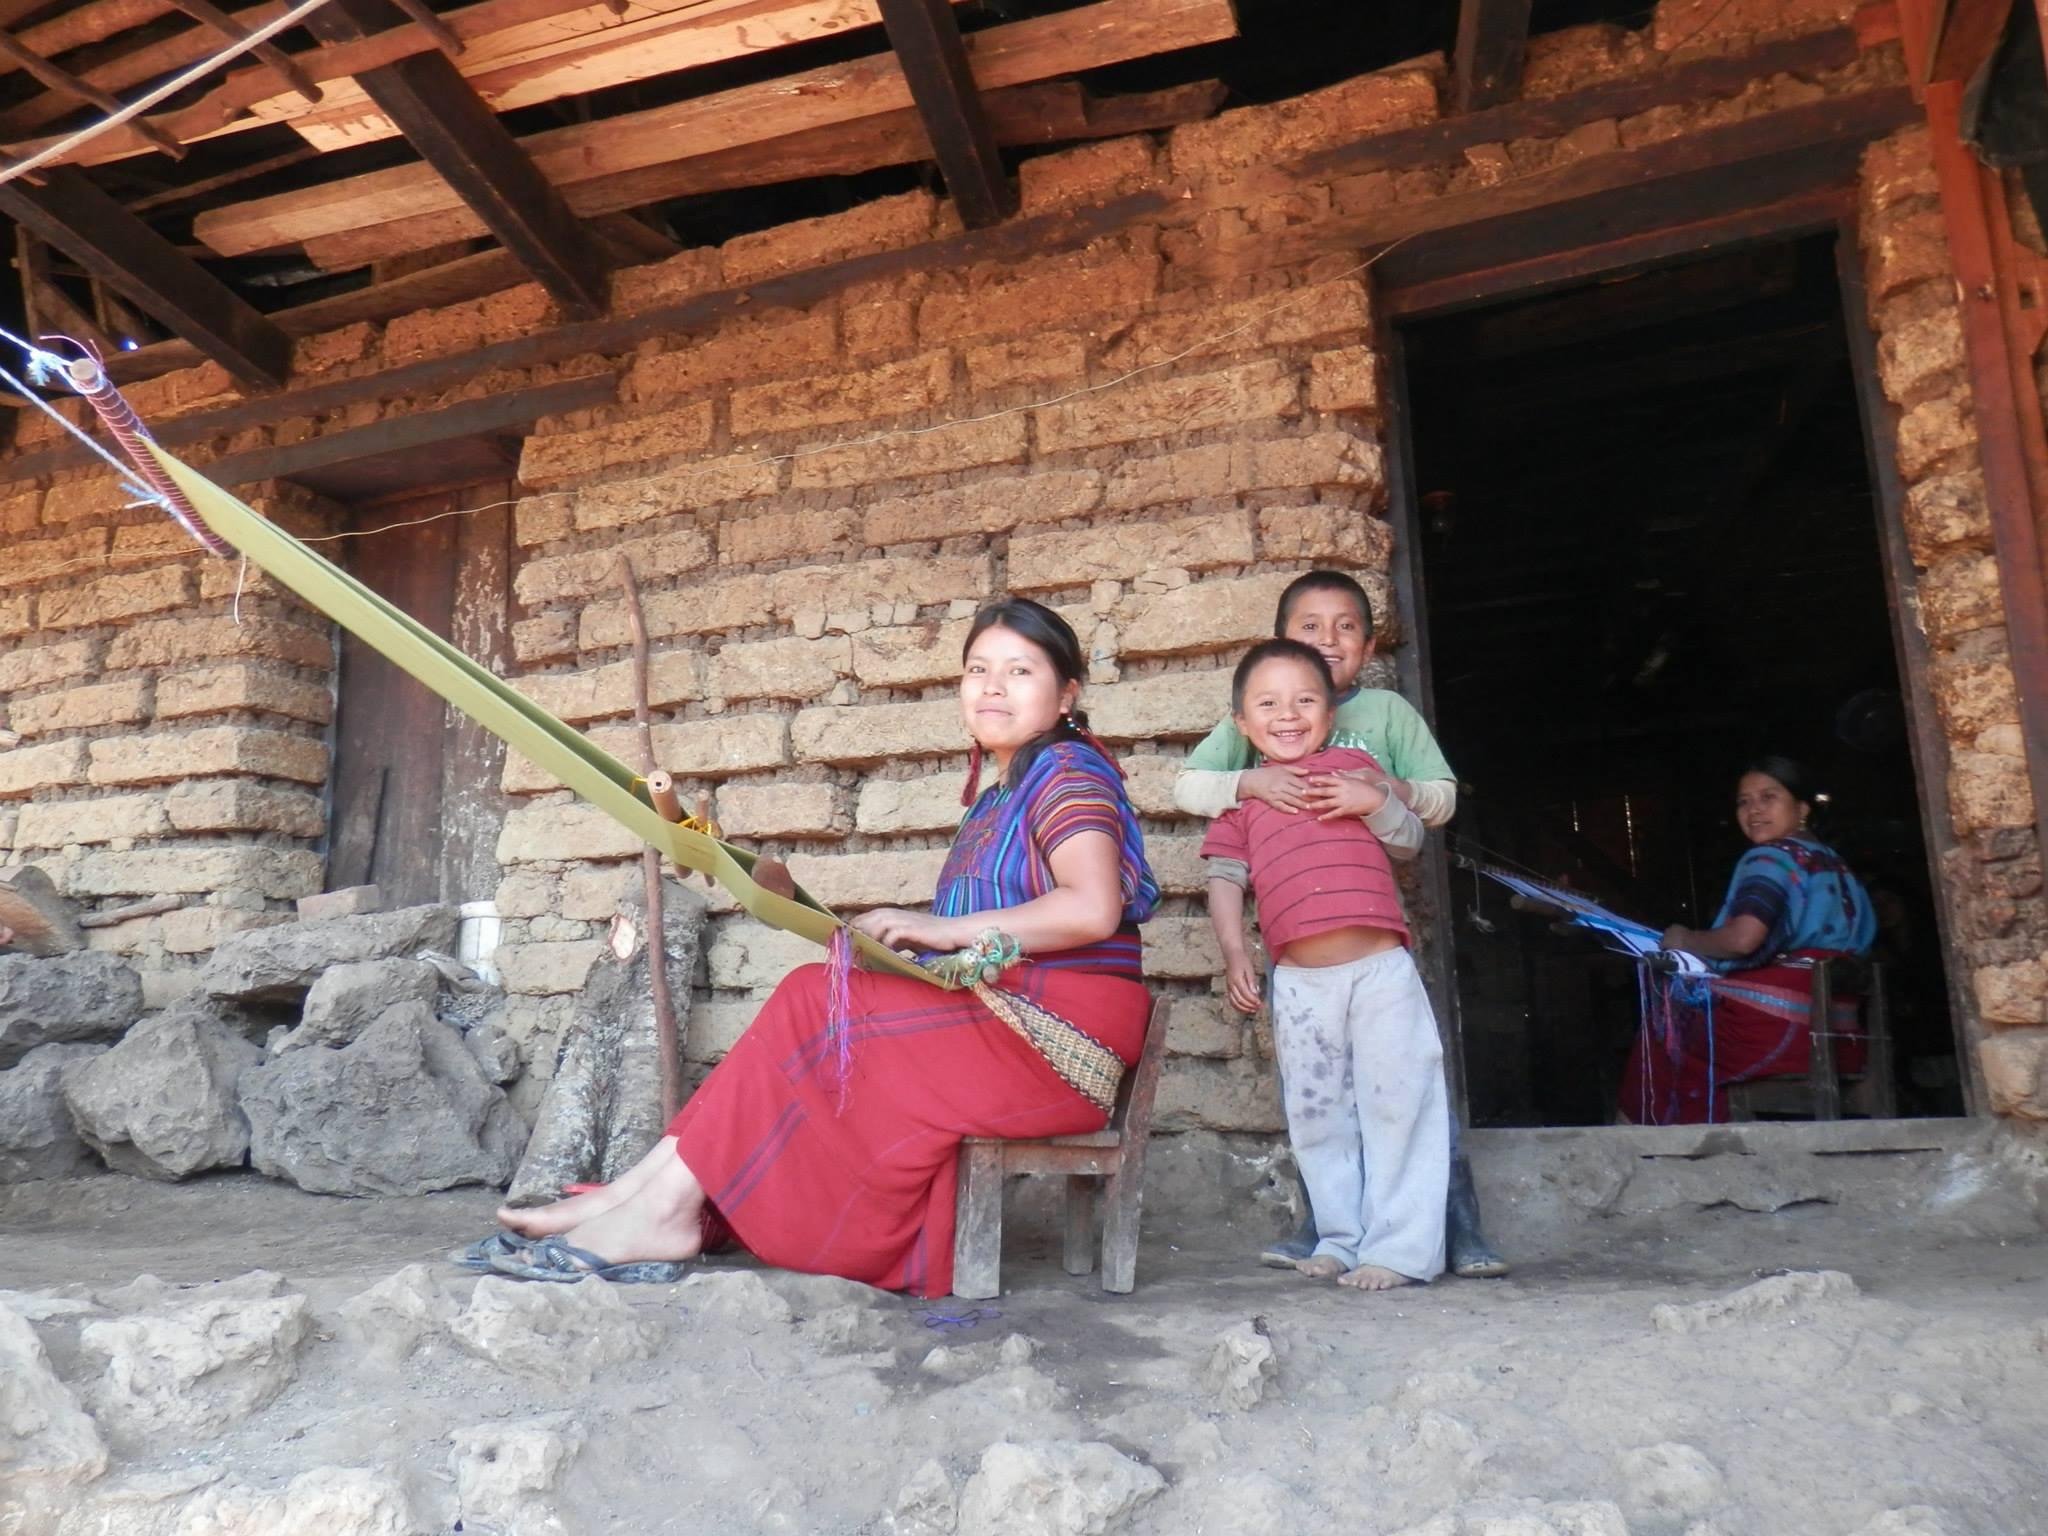 Mayan women working on their backstrap looms near Nebaj, K'iche, Guatemala in 2013. Photo: Madretierra Sato